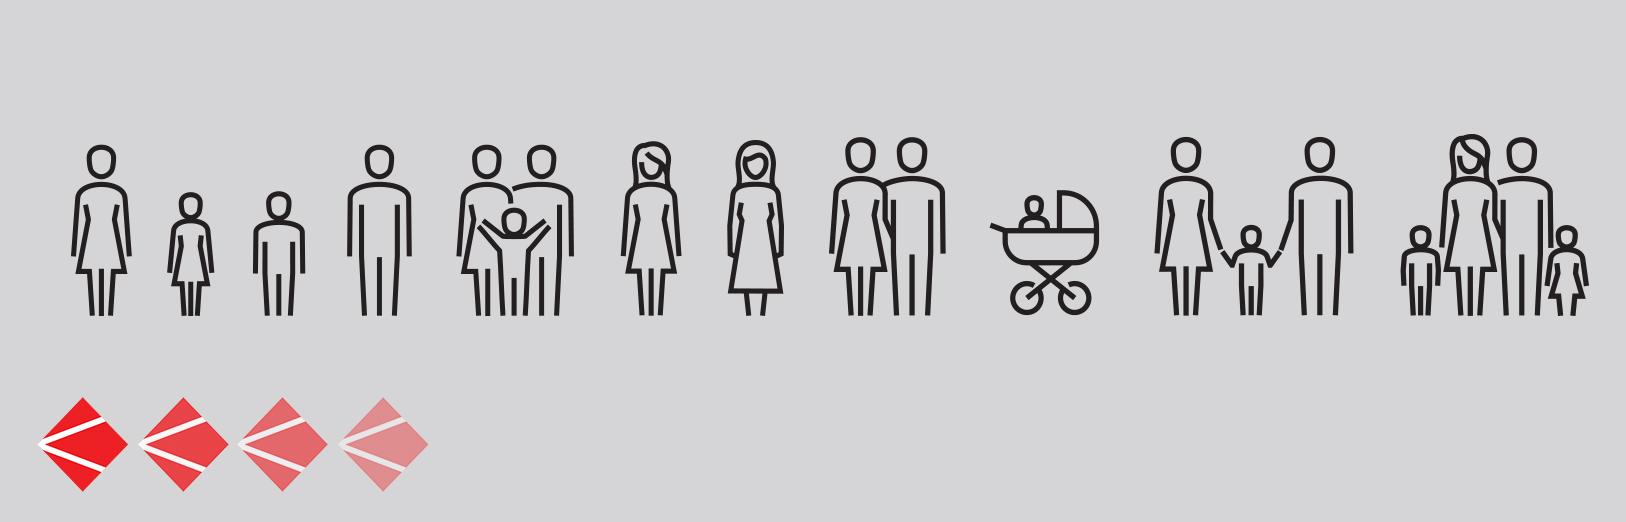 Lectia de portugheza - descrierea familiei in limba portugheza